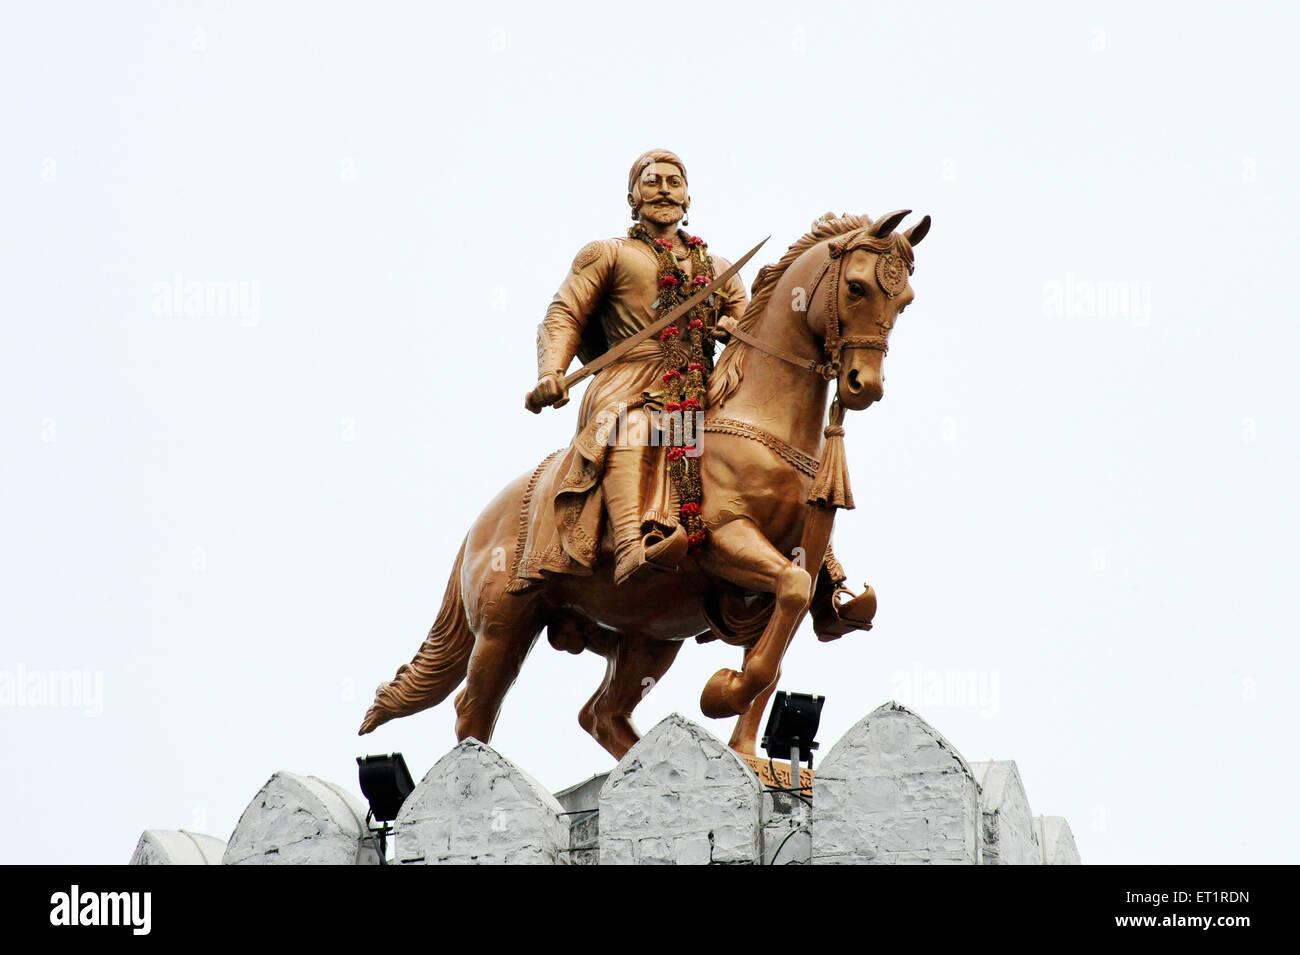 statue of shivaji maharaj on horse at akluj fort solapur stock photo royalty free image